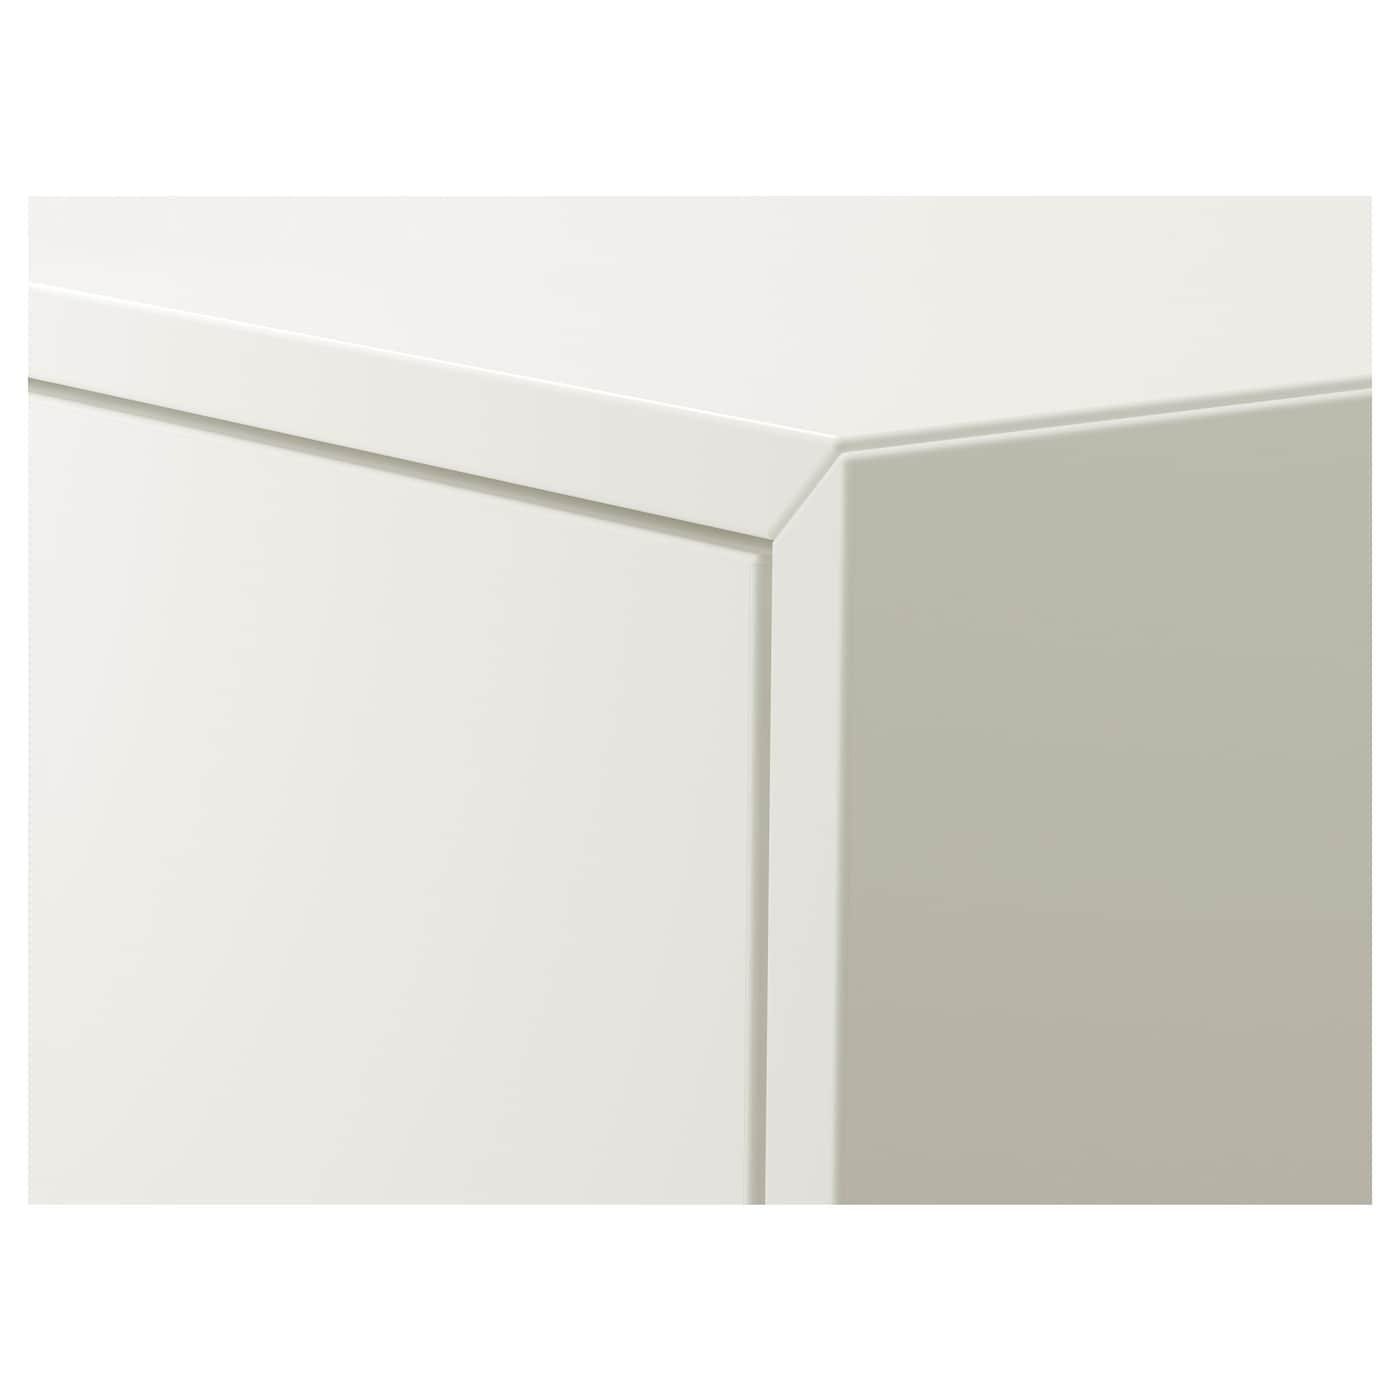 EKET エーケト キャビネット 扉/棚板1付き, ホワイト, 35x35x70 cm